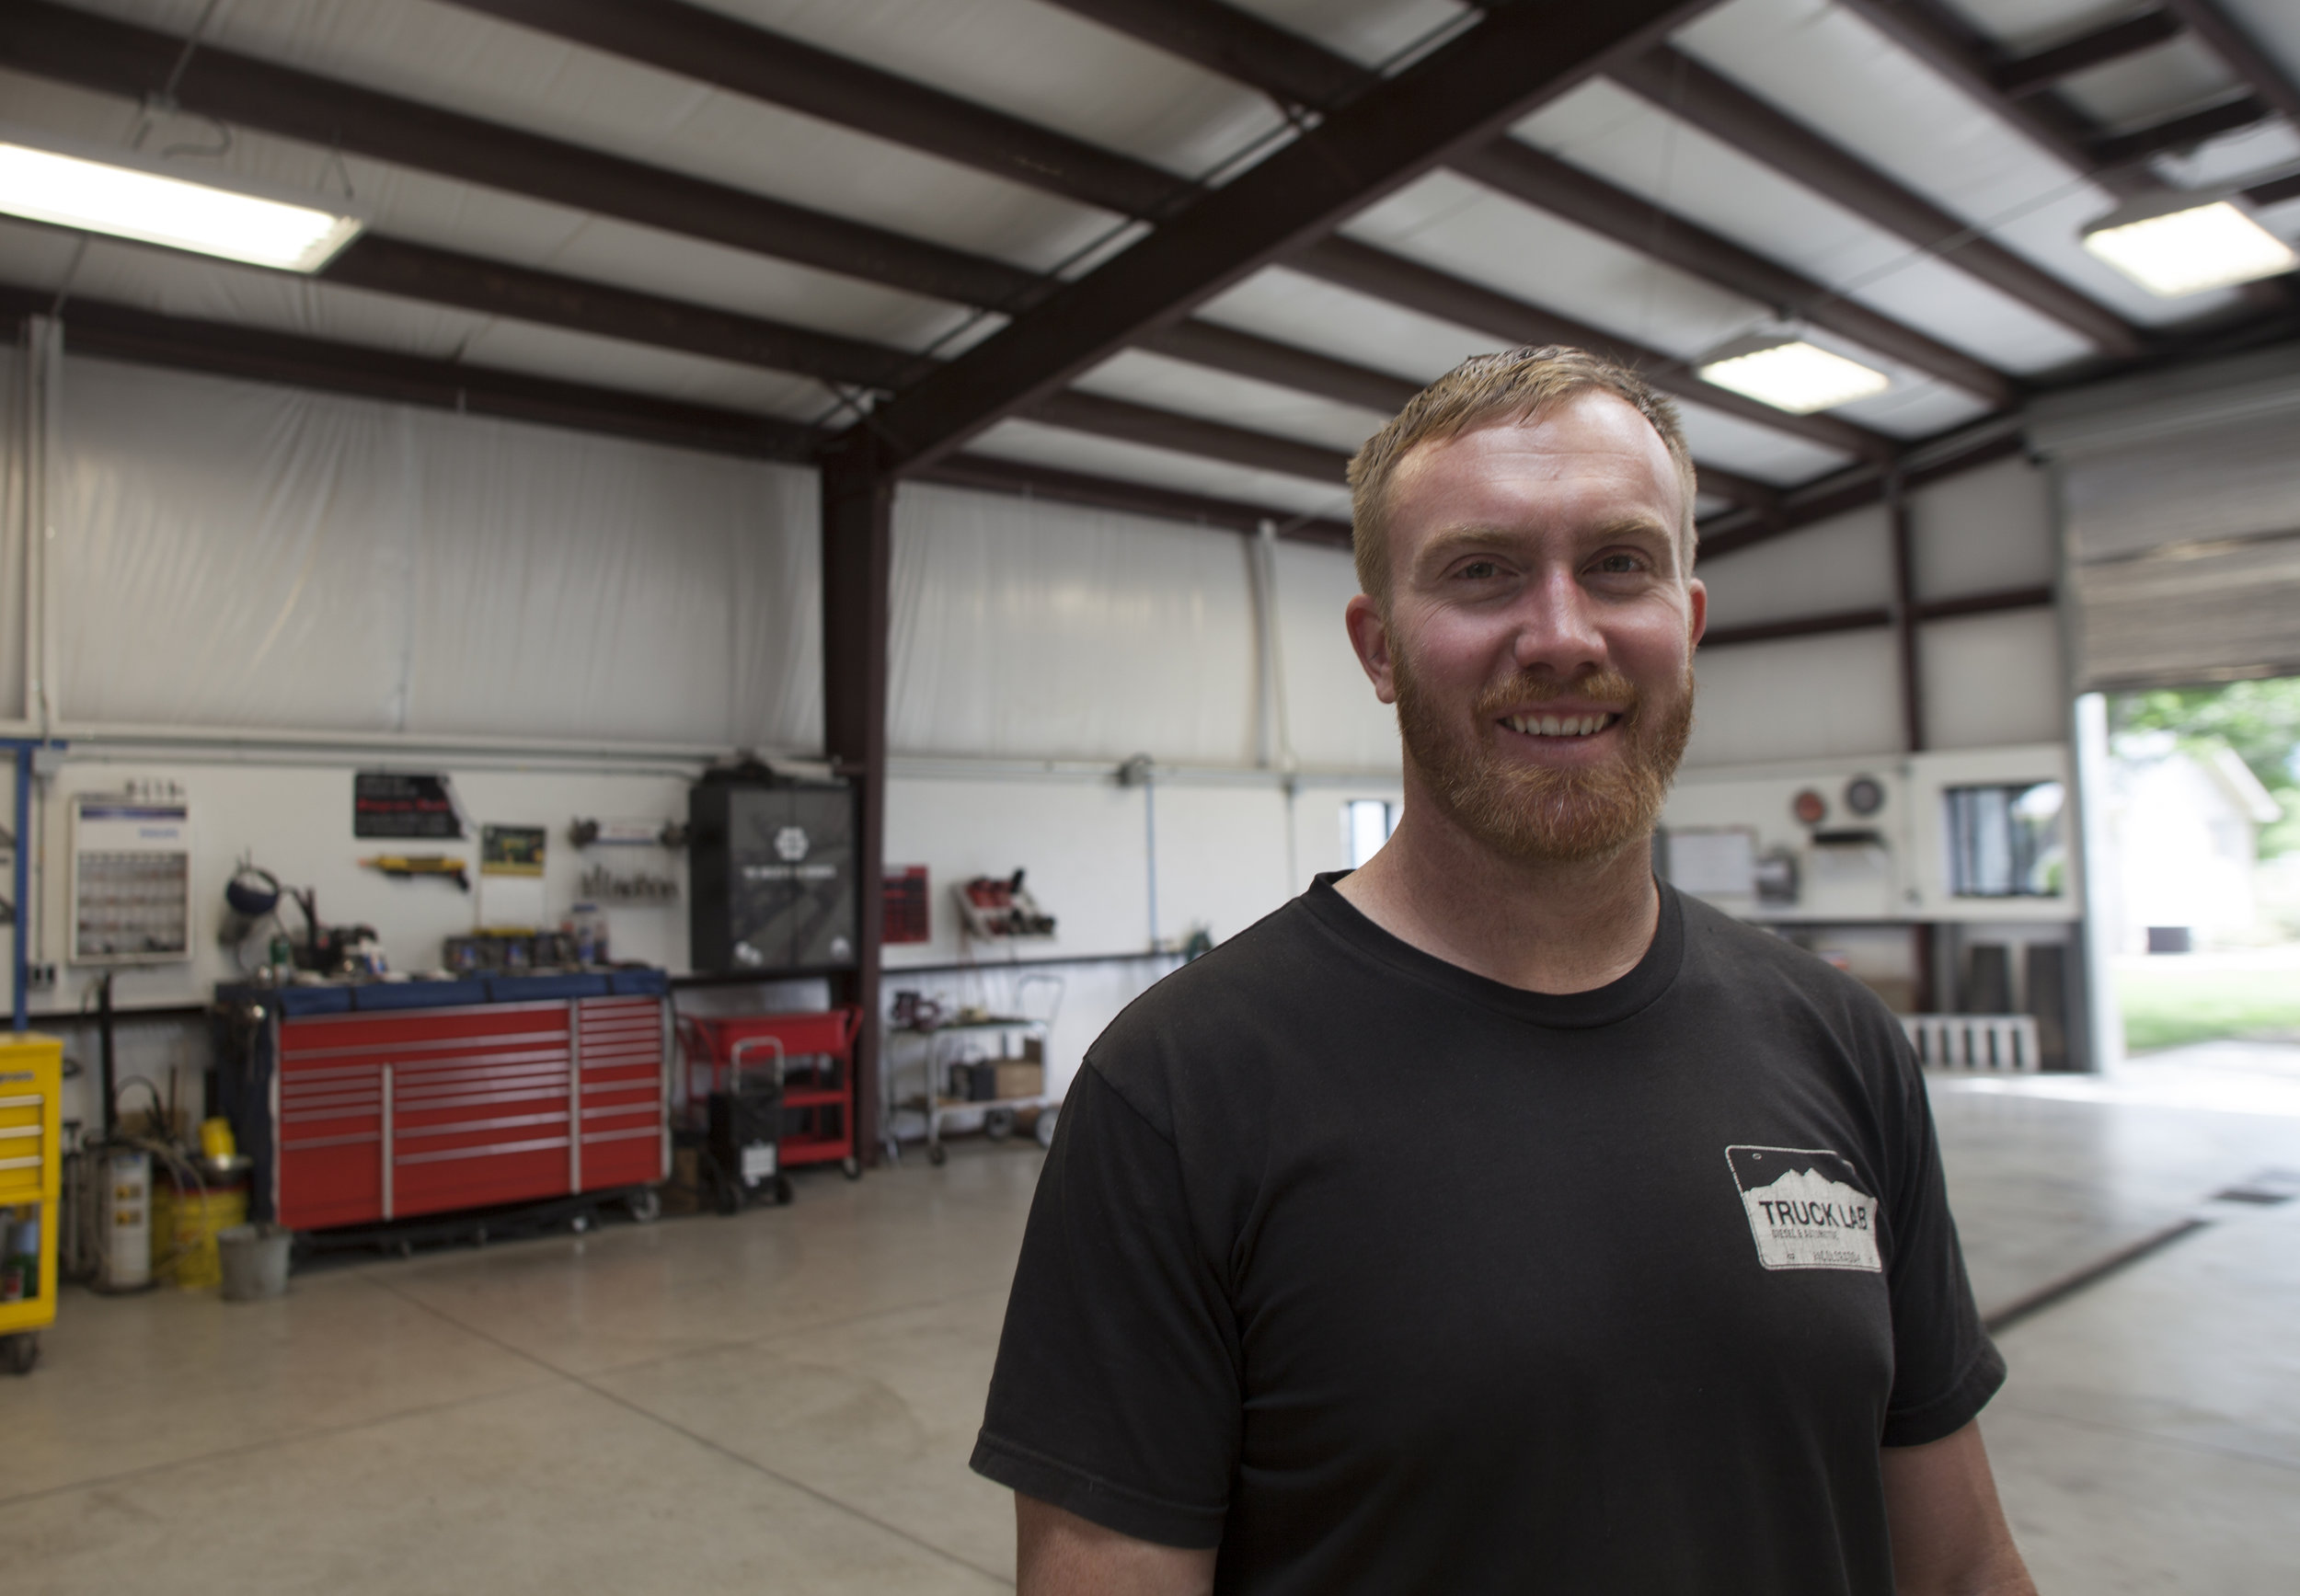 Tristan Barr - Owner/Operator